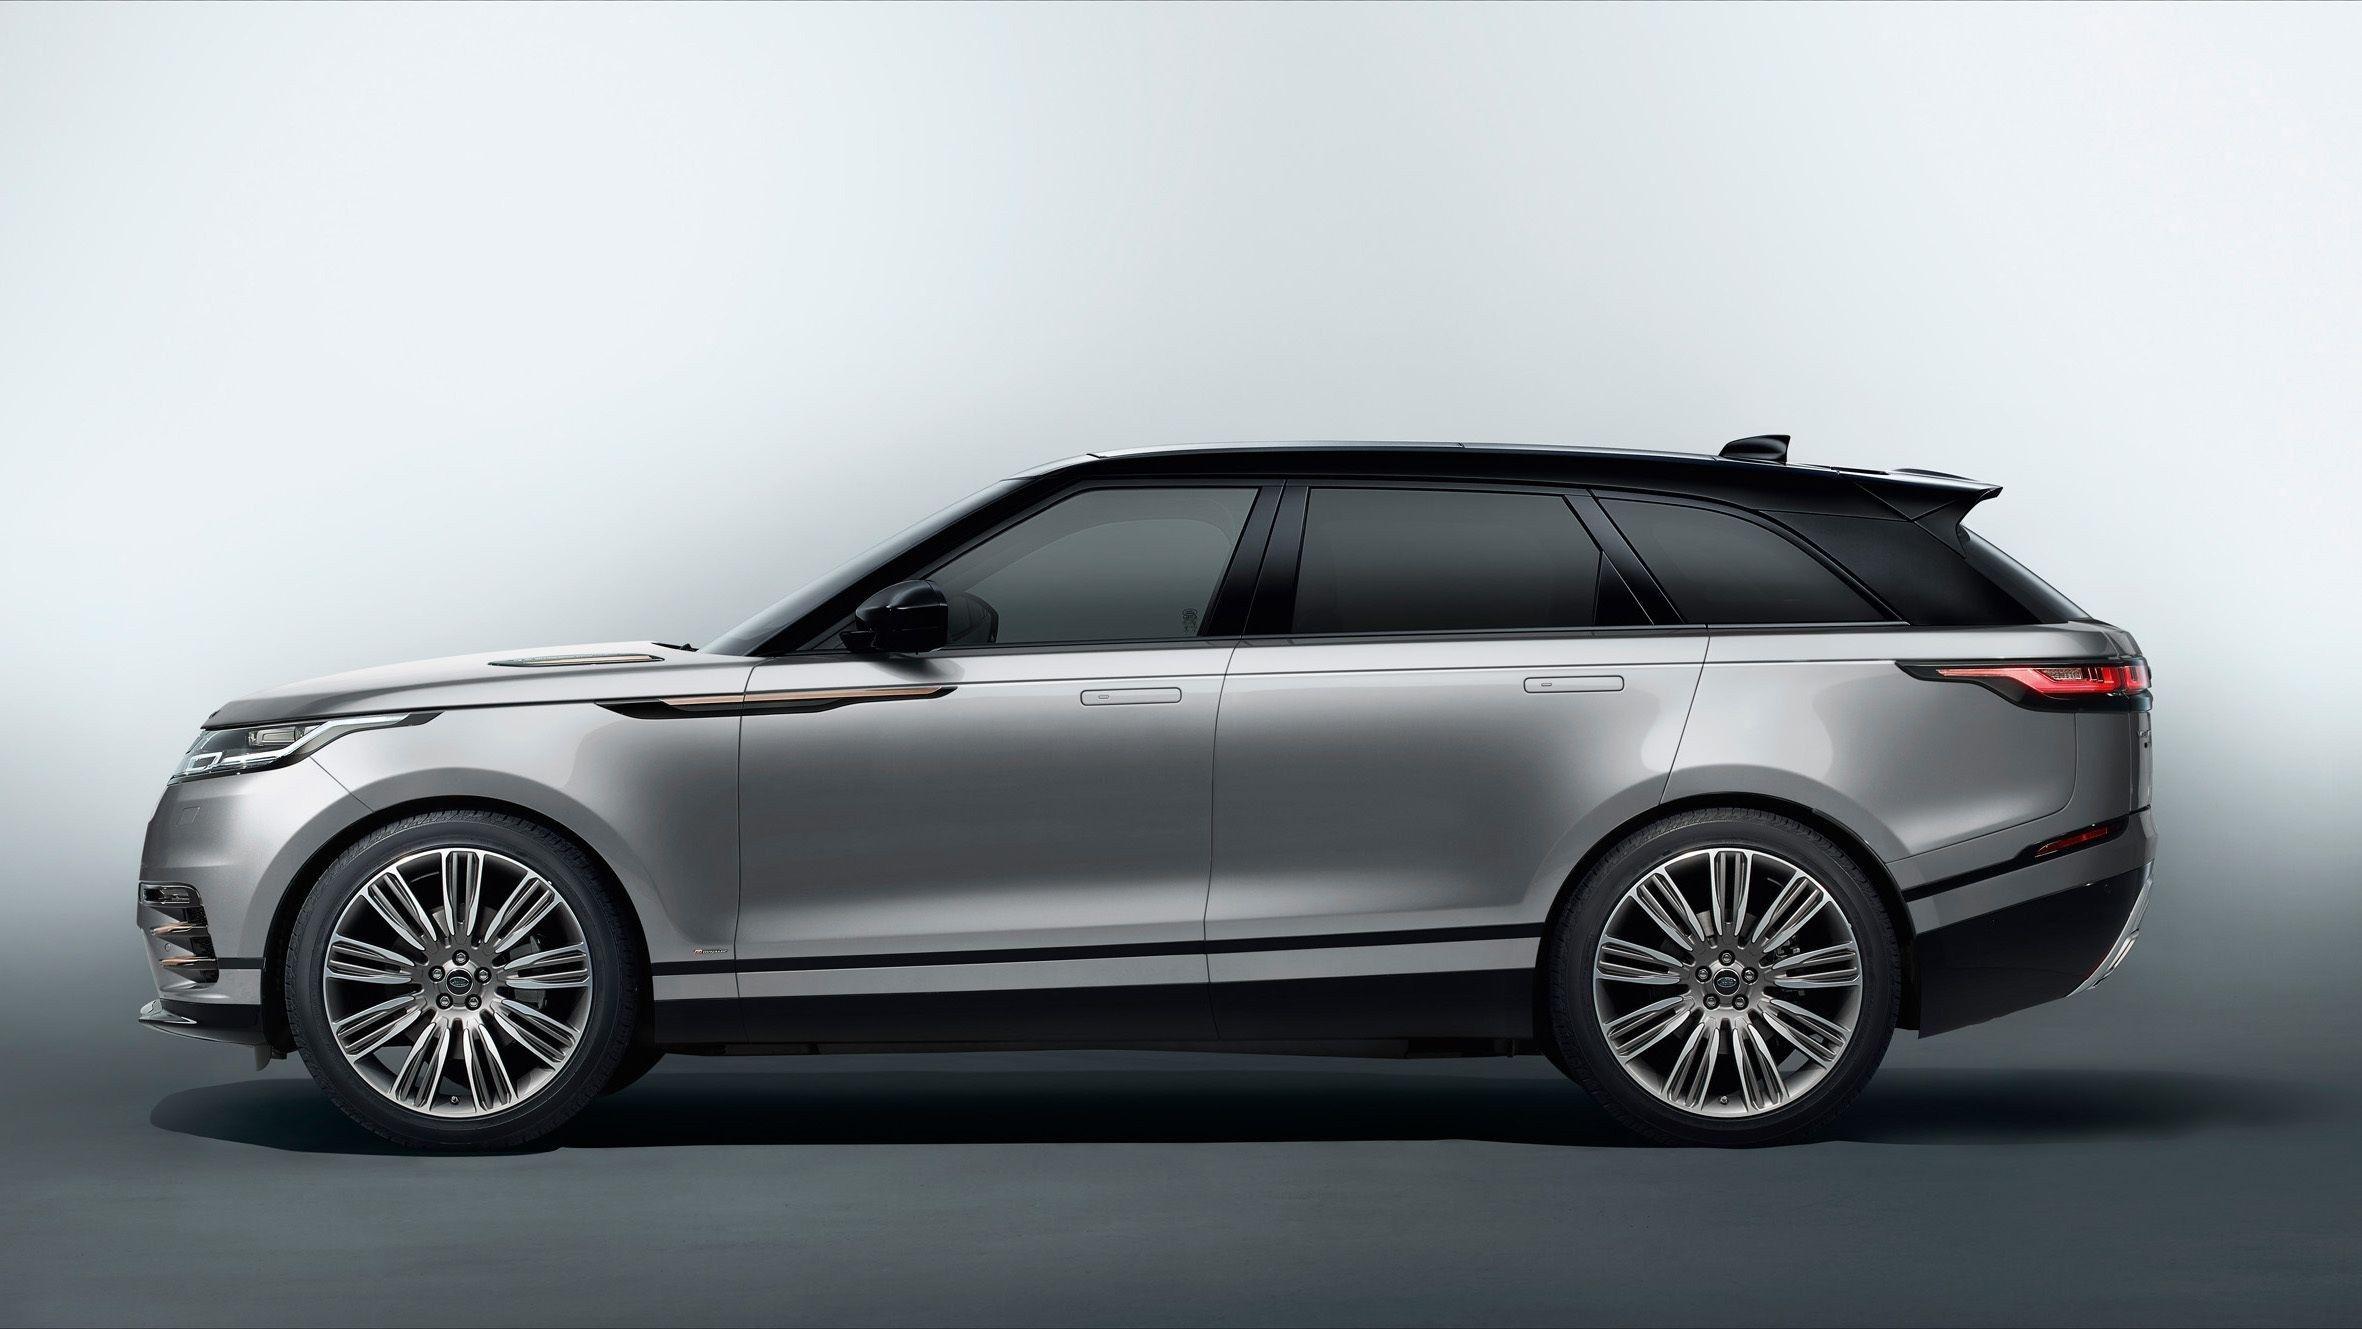 2020 Range Rover Velar Svr First Drive (With images